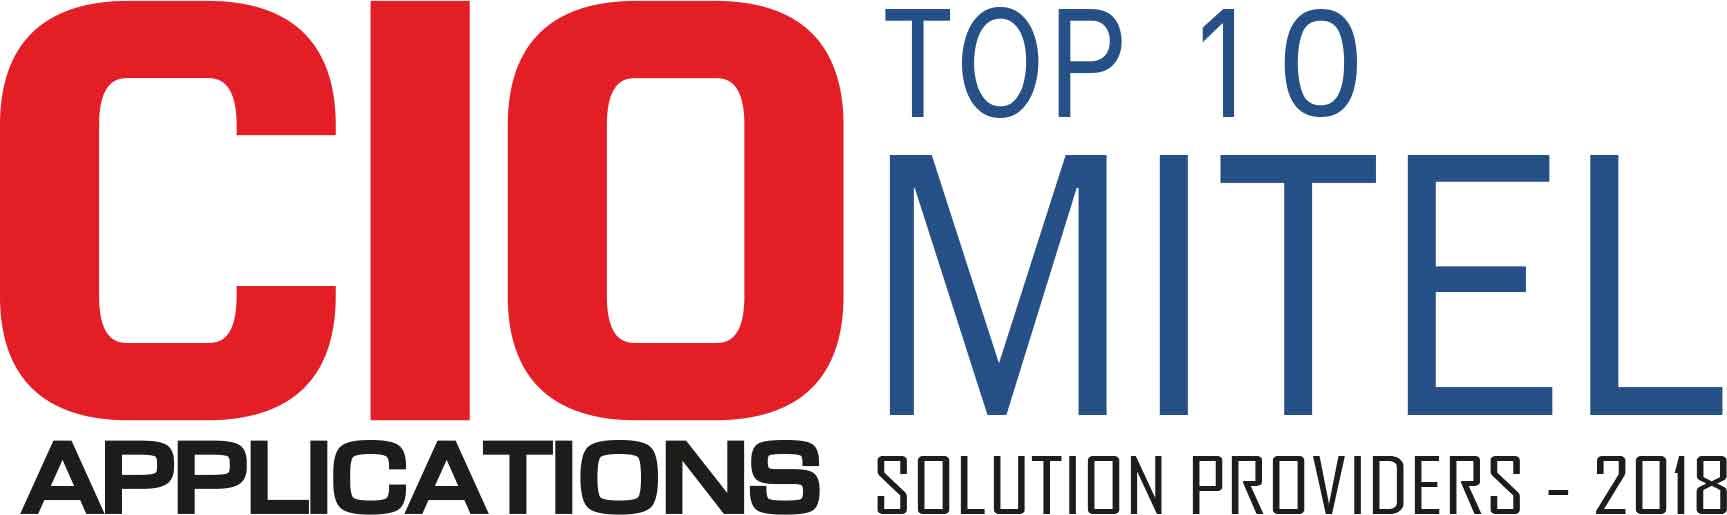 Top 10 Mitel Solution Companies - 2018